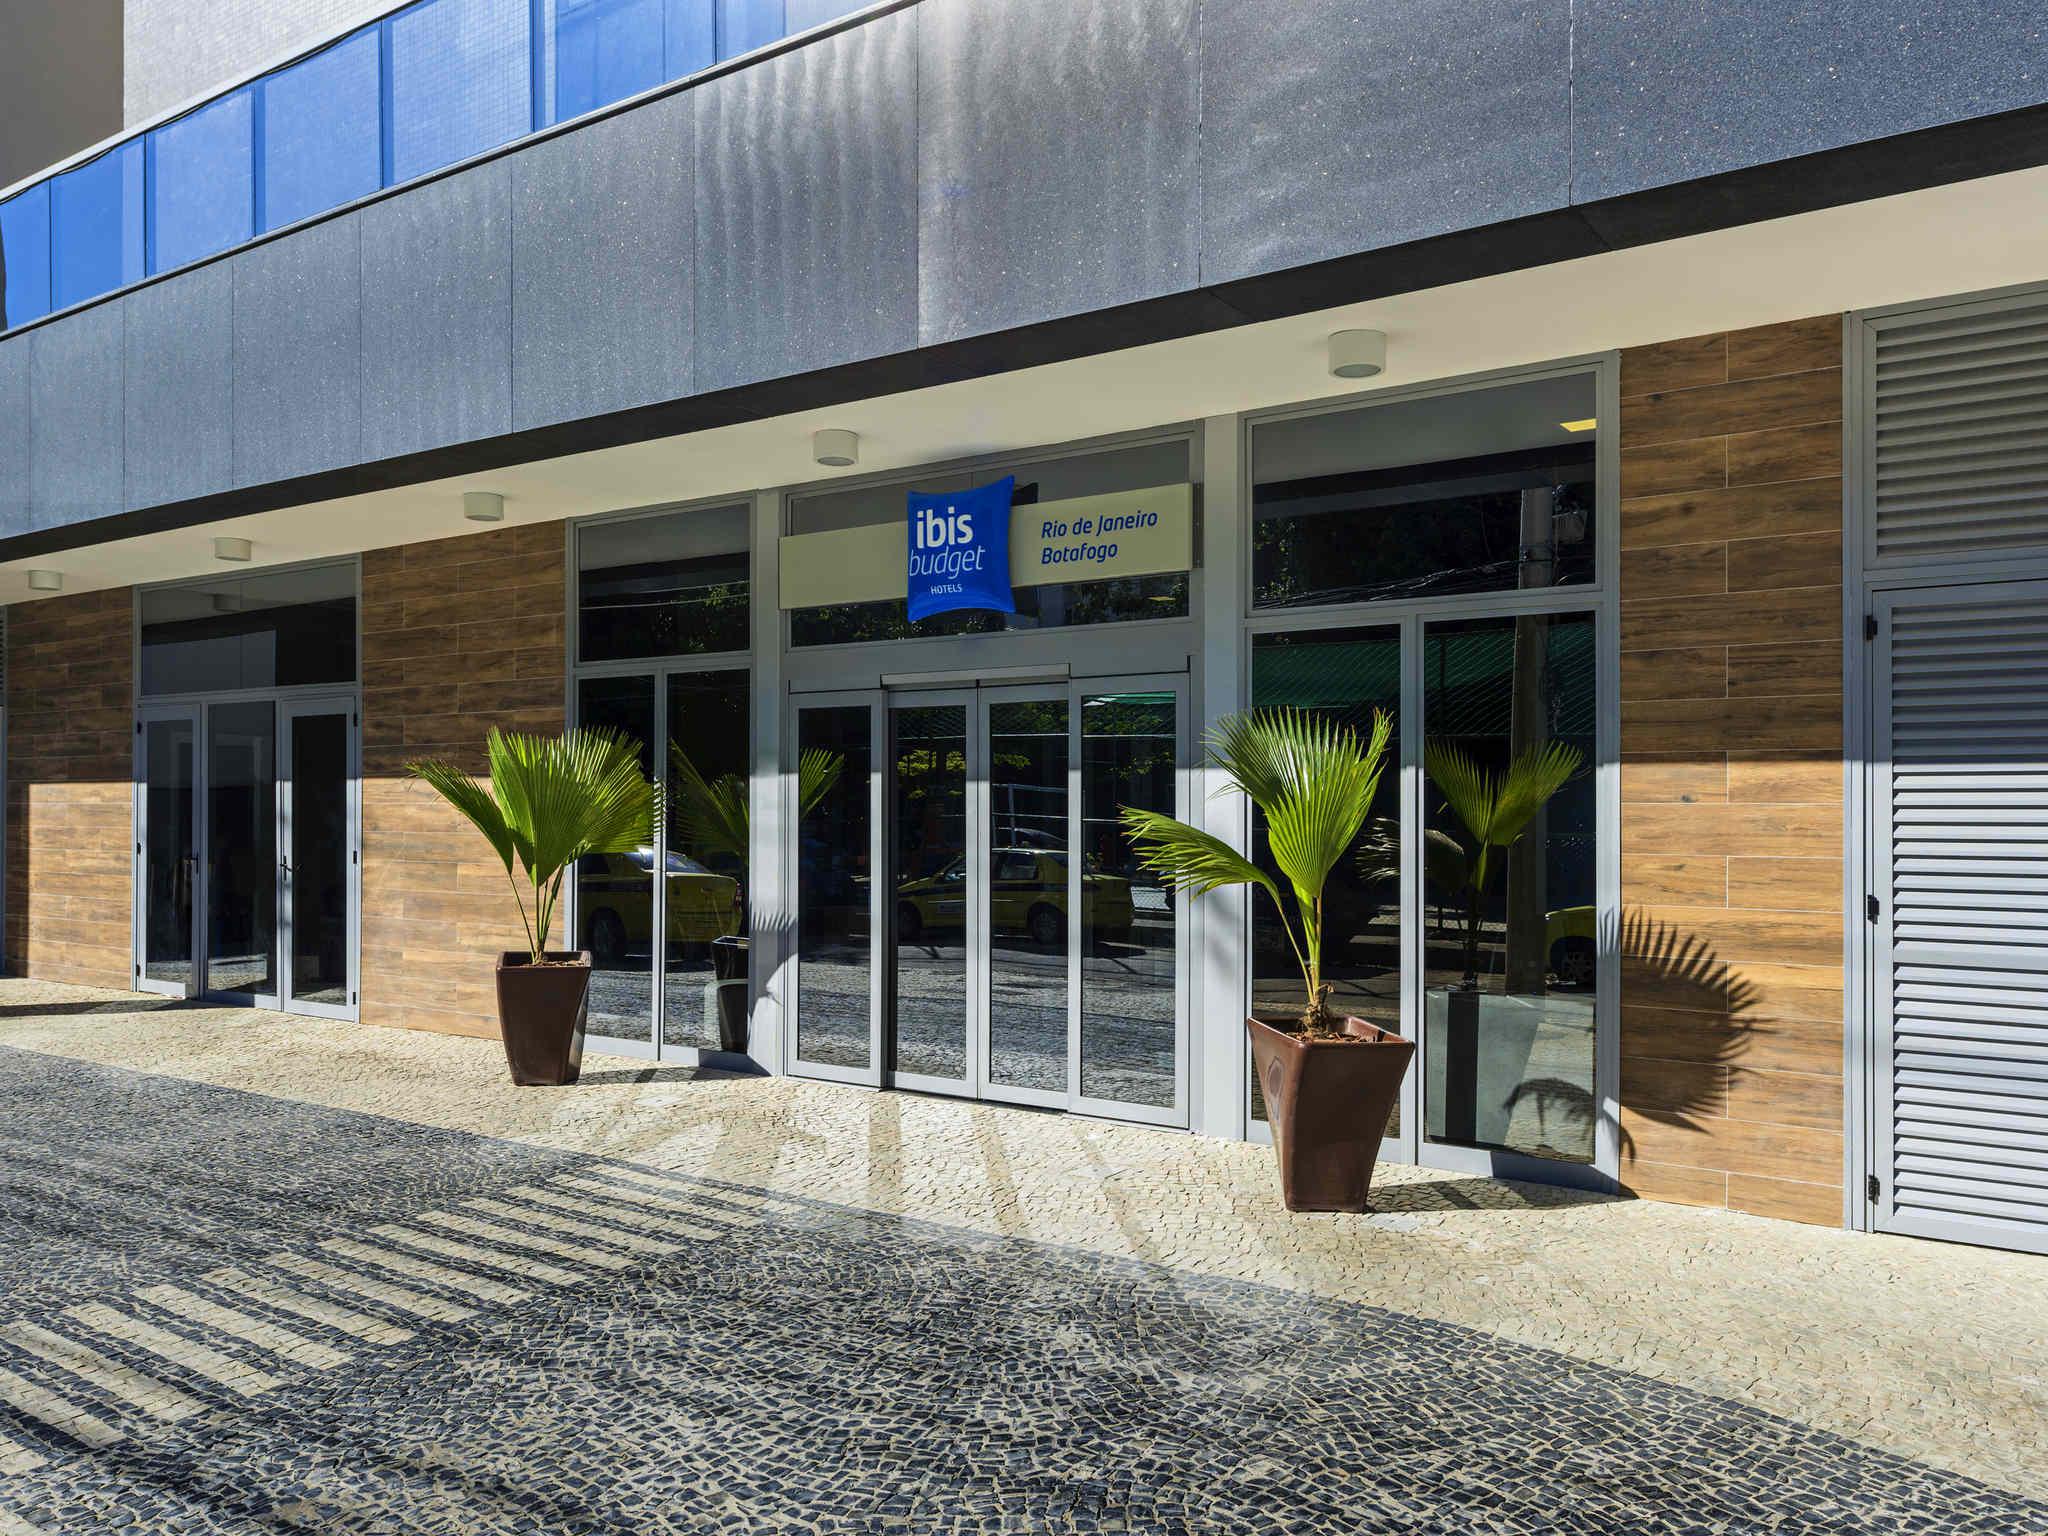 Hôtel - ibis budget RJ Praia de Botafogo